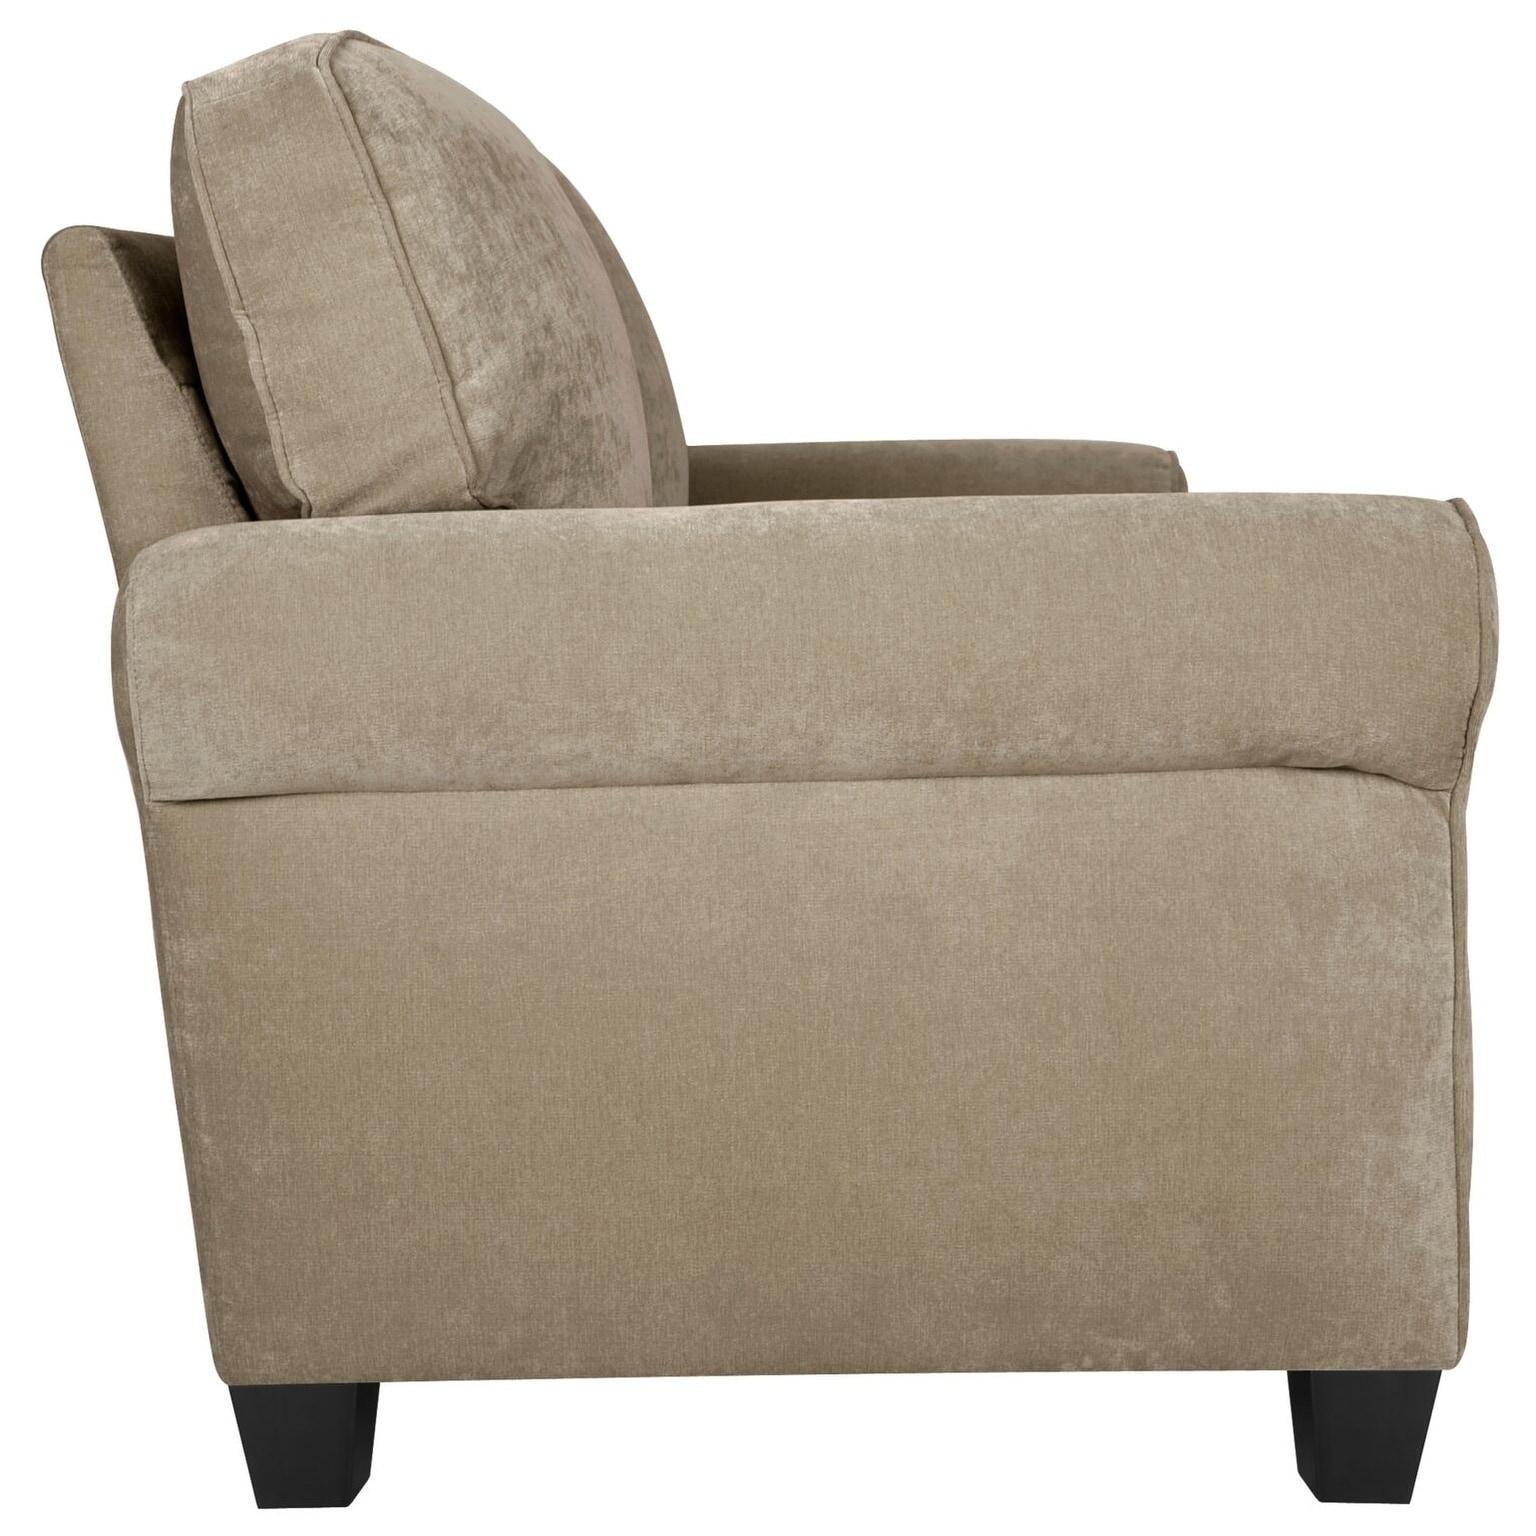 Enjoyable Serta Copenhagen 78 Inch Sofa Machost Co Dining Chair Design Ideas Machostcouk